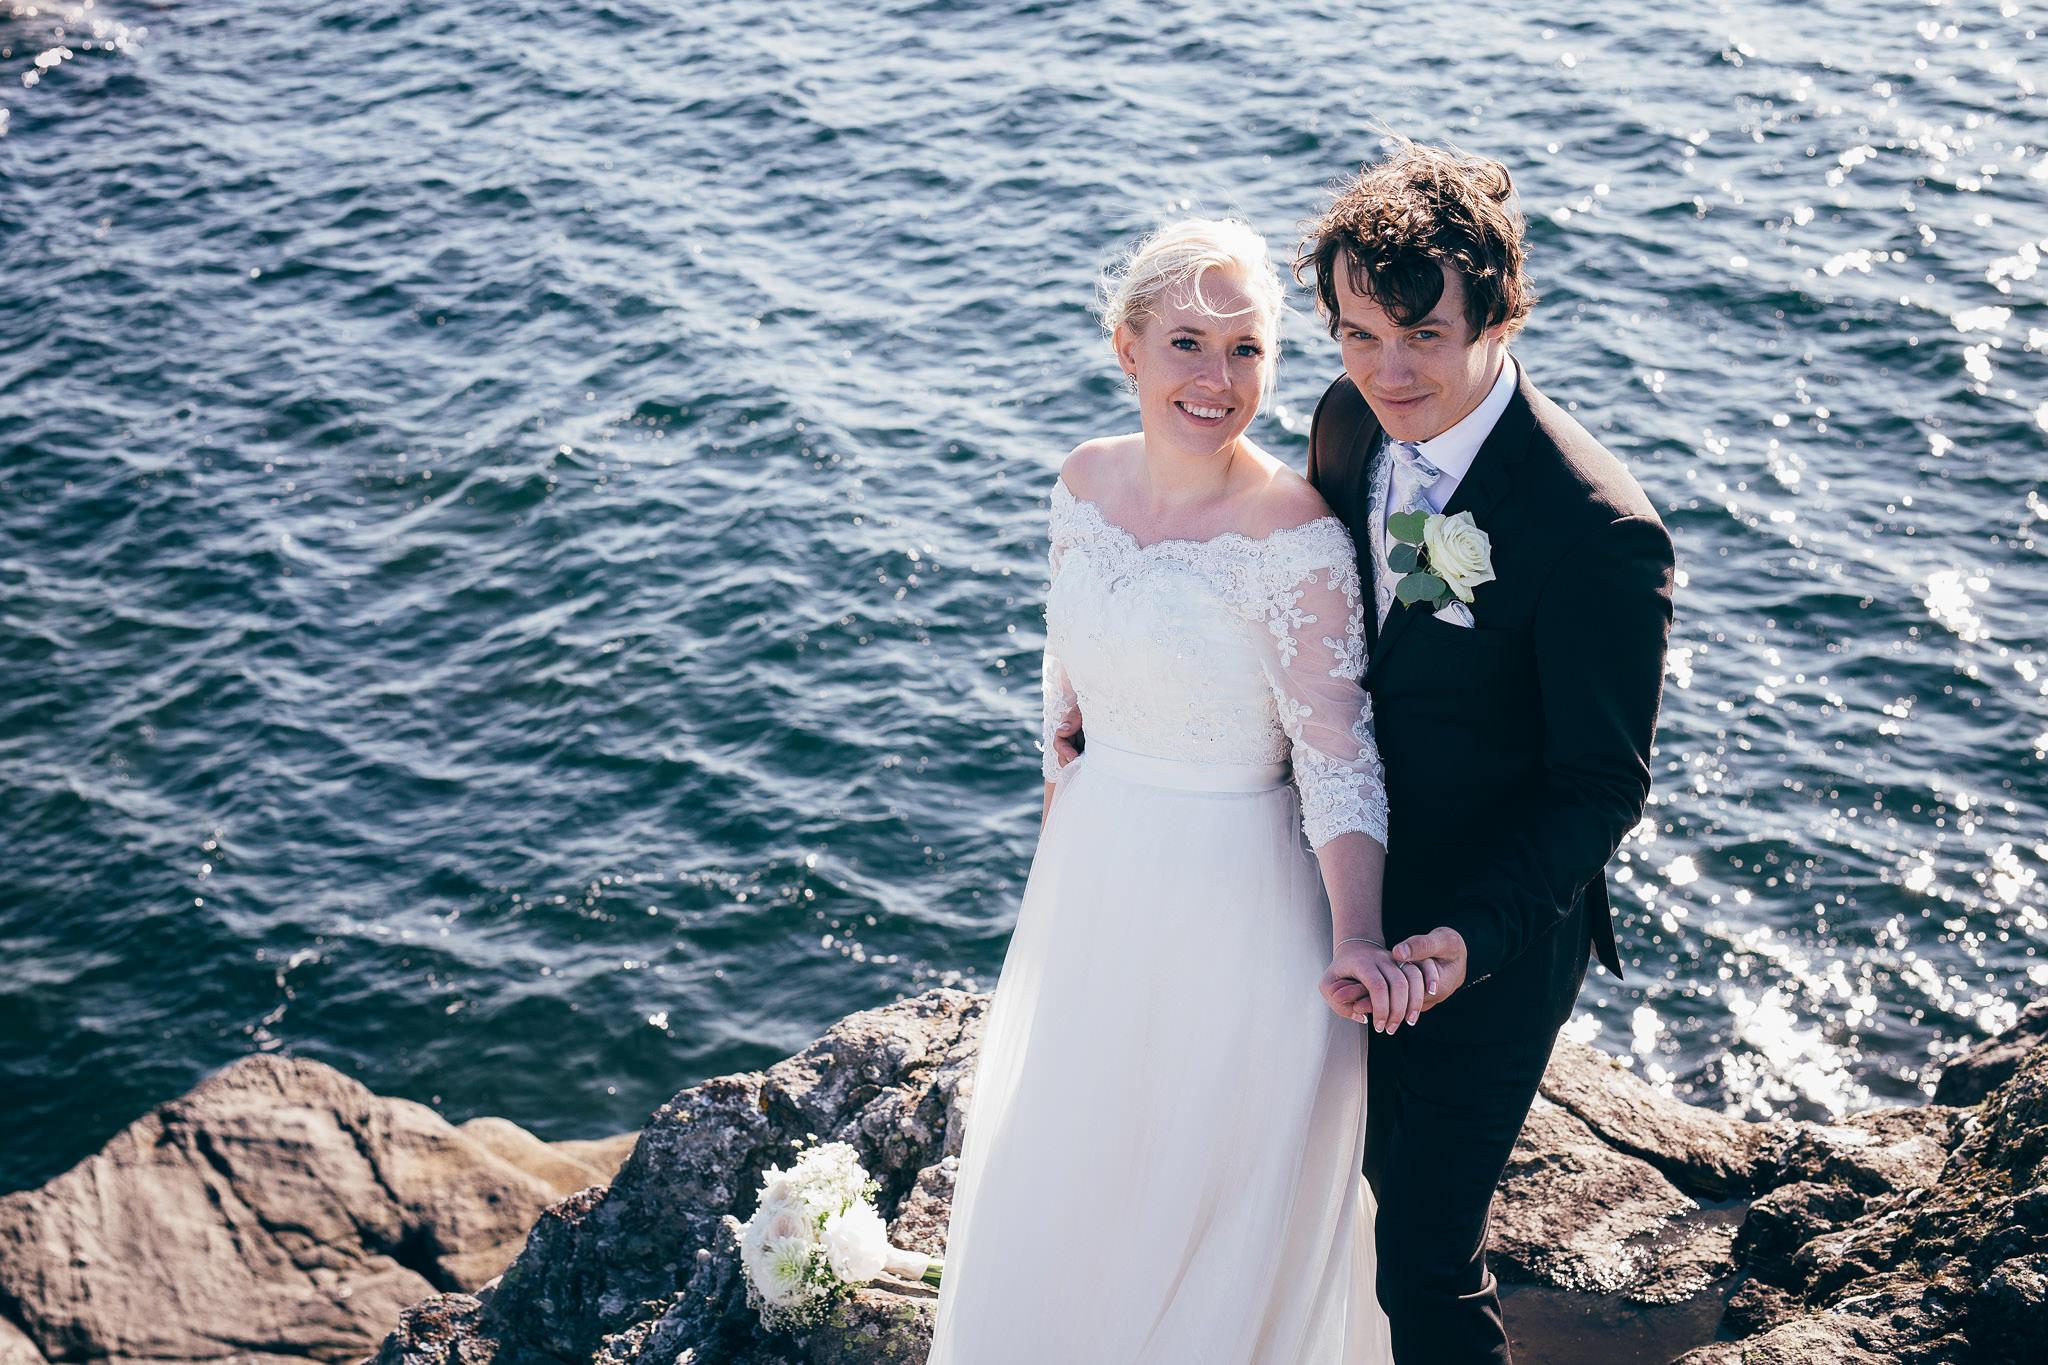 Wedding+Photographer+Norway+Bryllupsfotograf+Casey+Arneson+JT-125.jpg